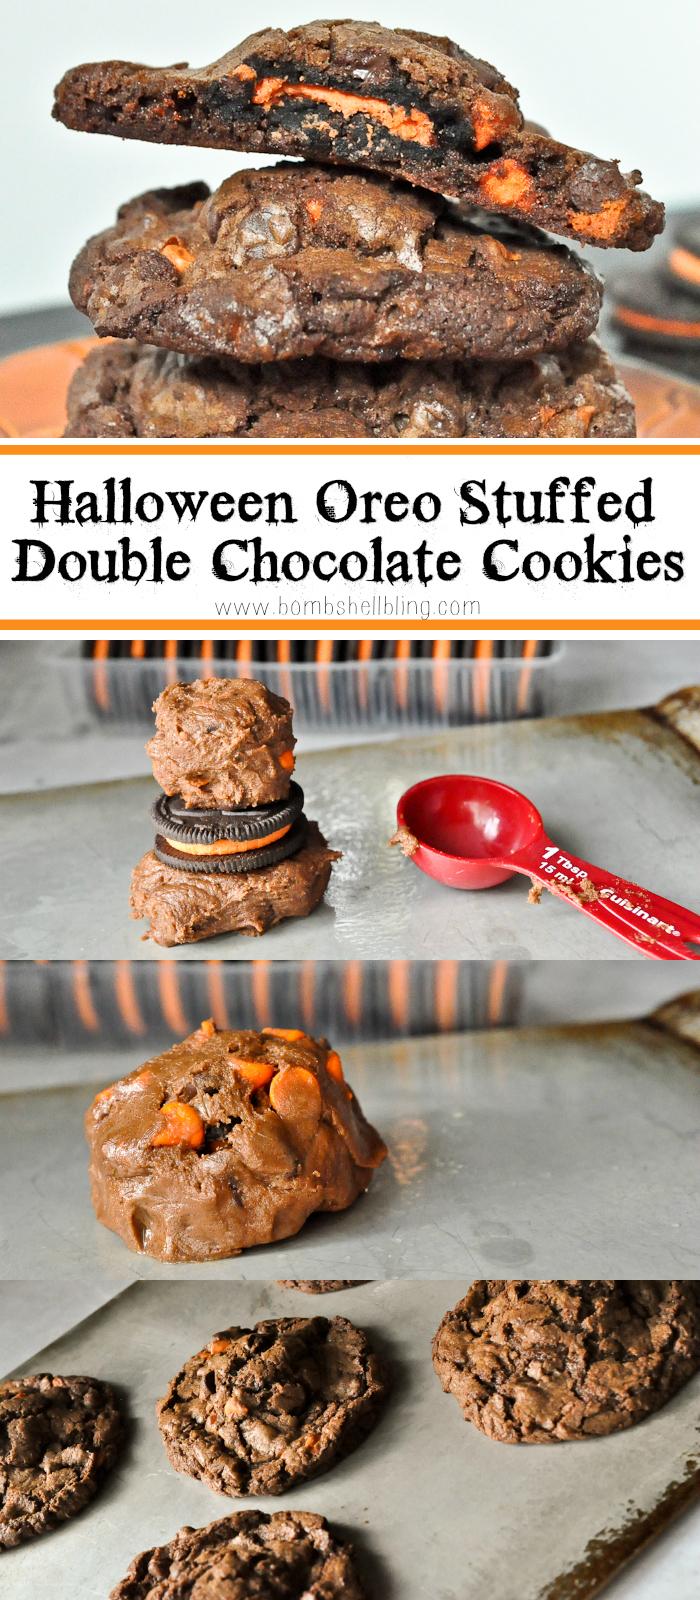 WHOA MAMA!!! Halloween Oreo Stuffed Double Chocolate Cookies!!!!!